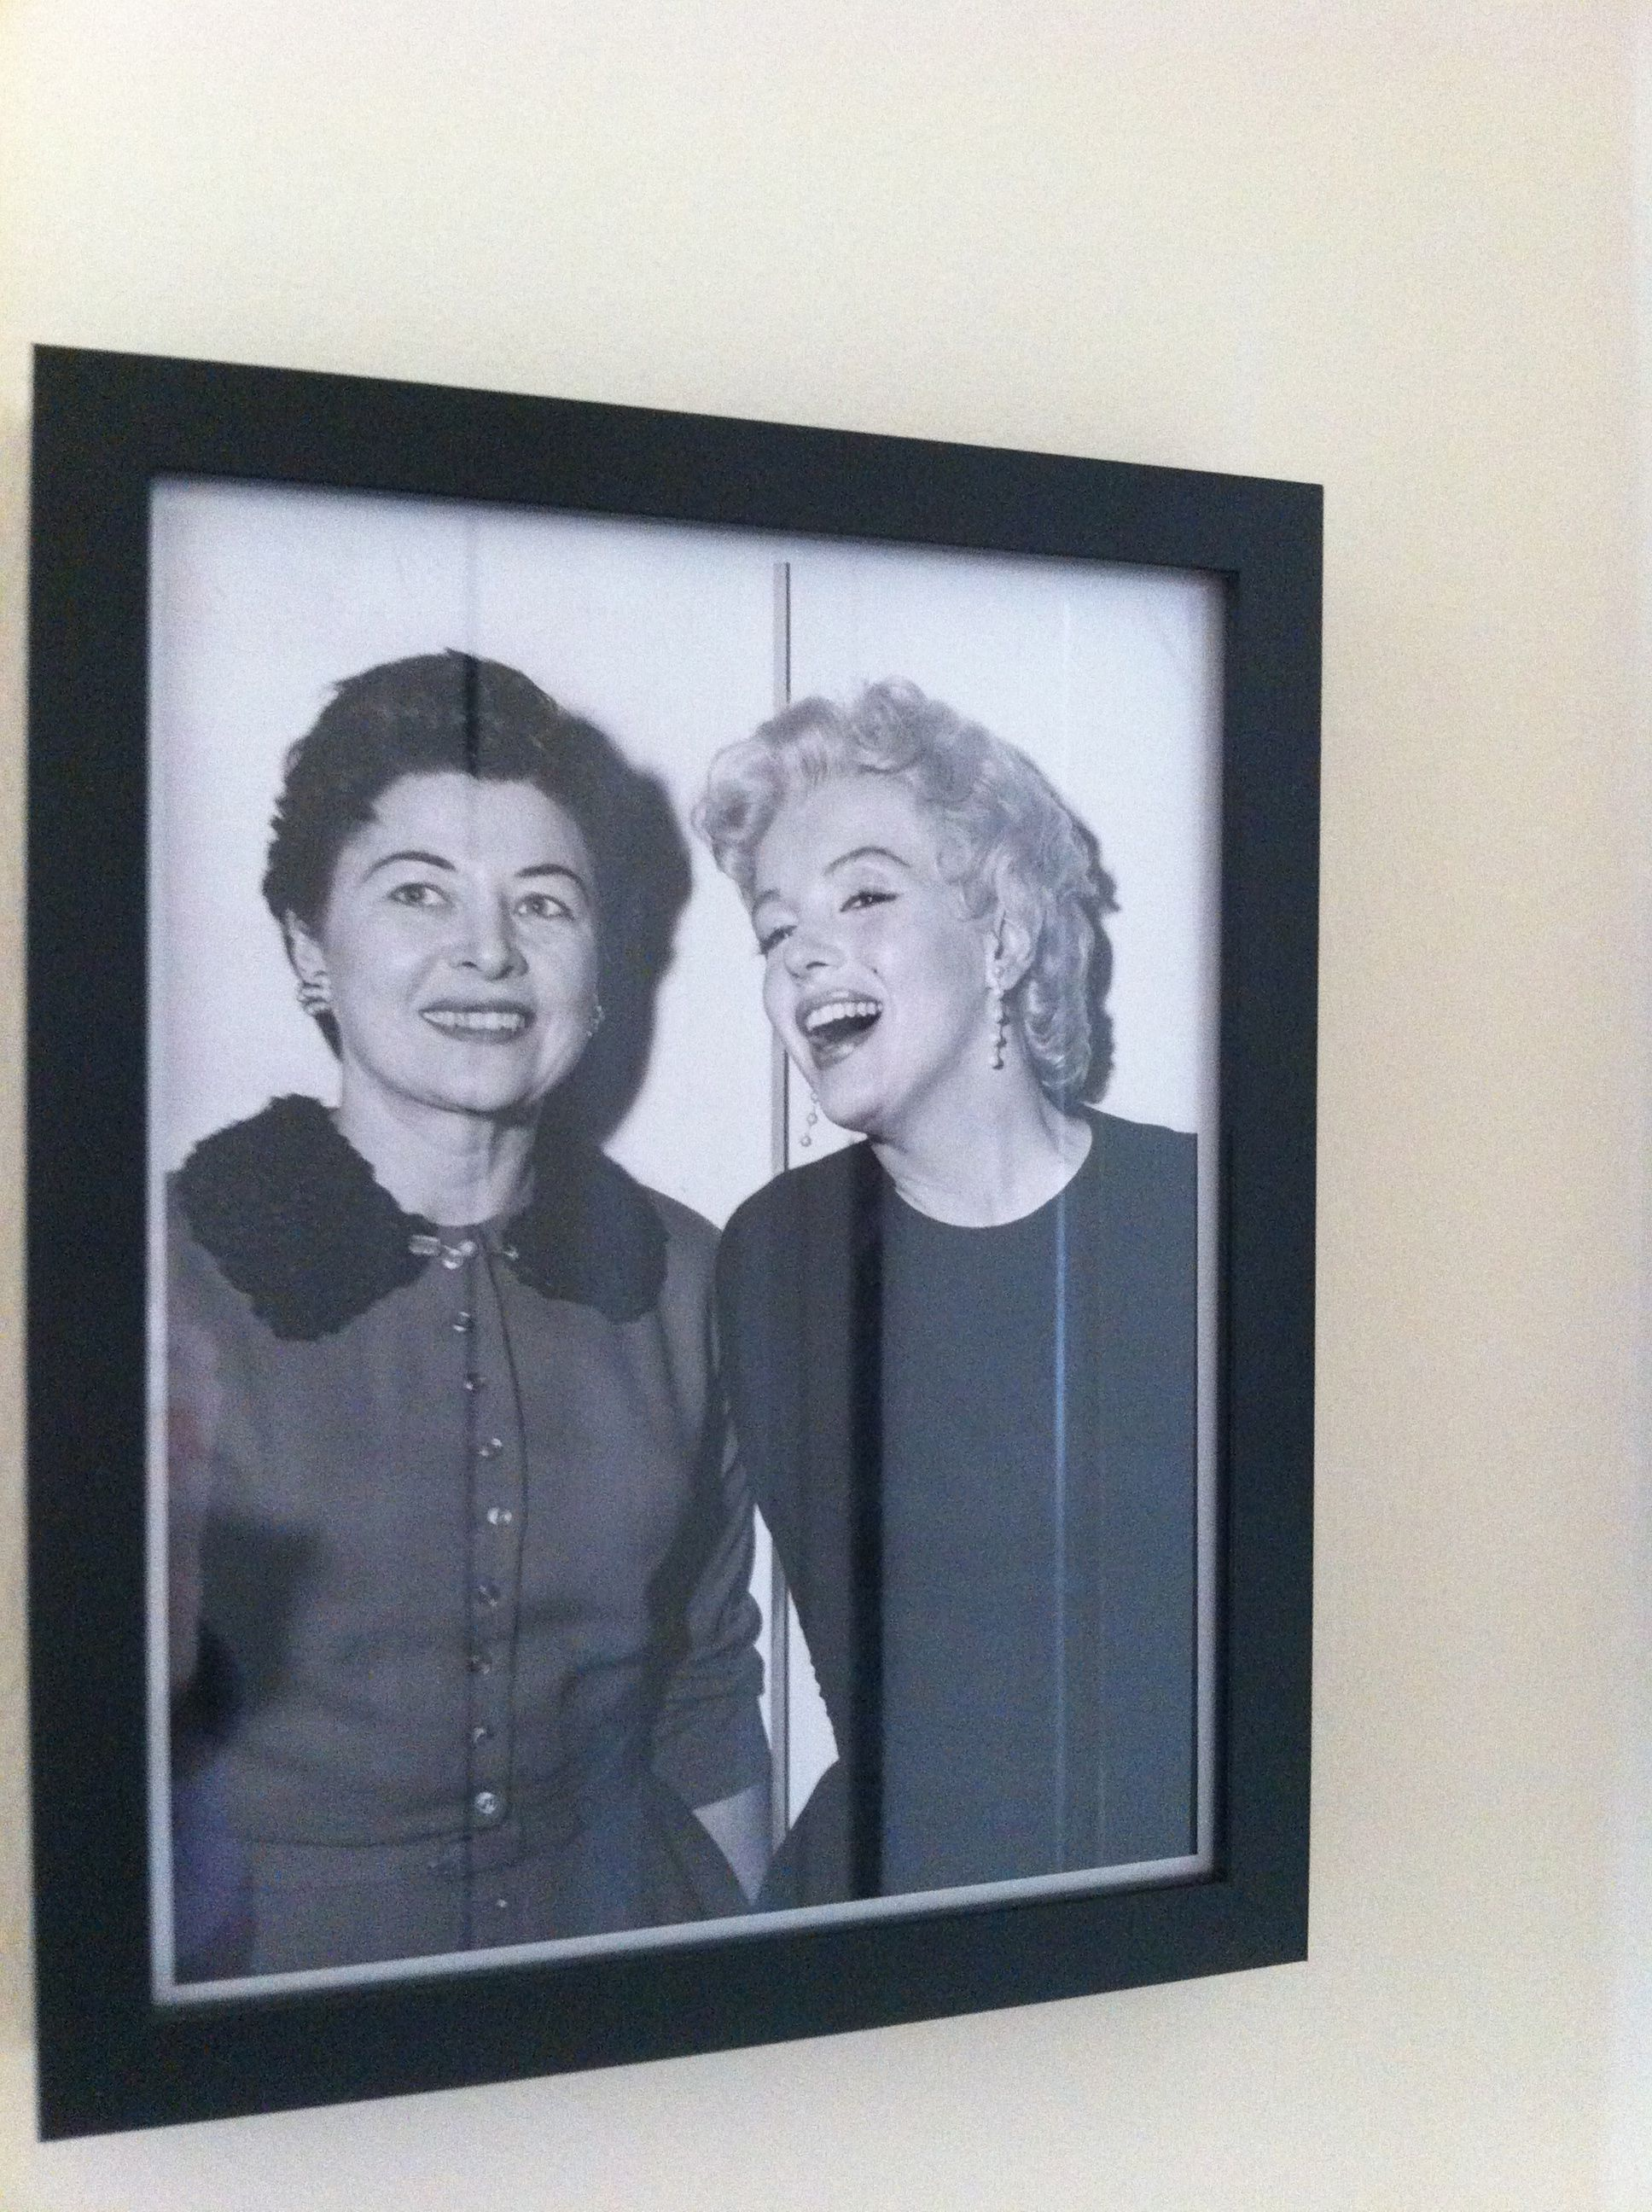 My Aunt Freya with Marilyn Monroe